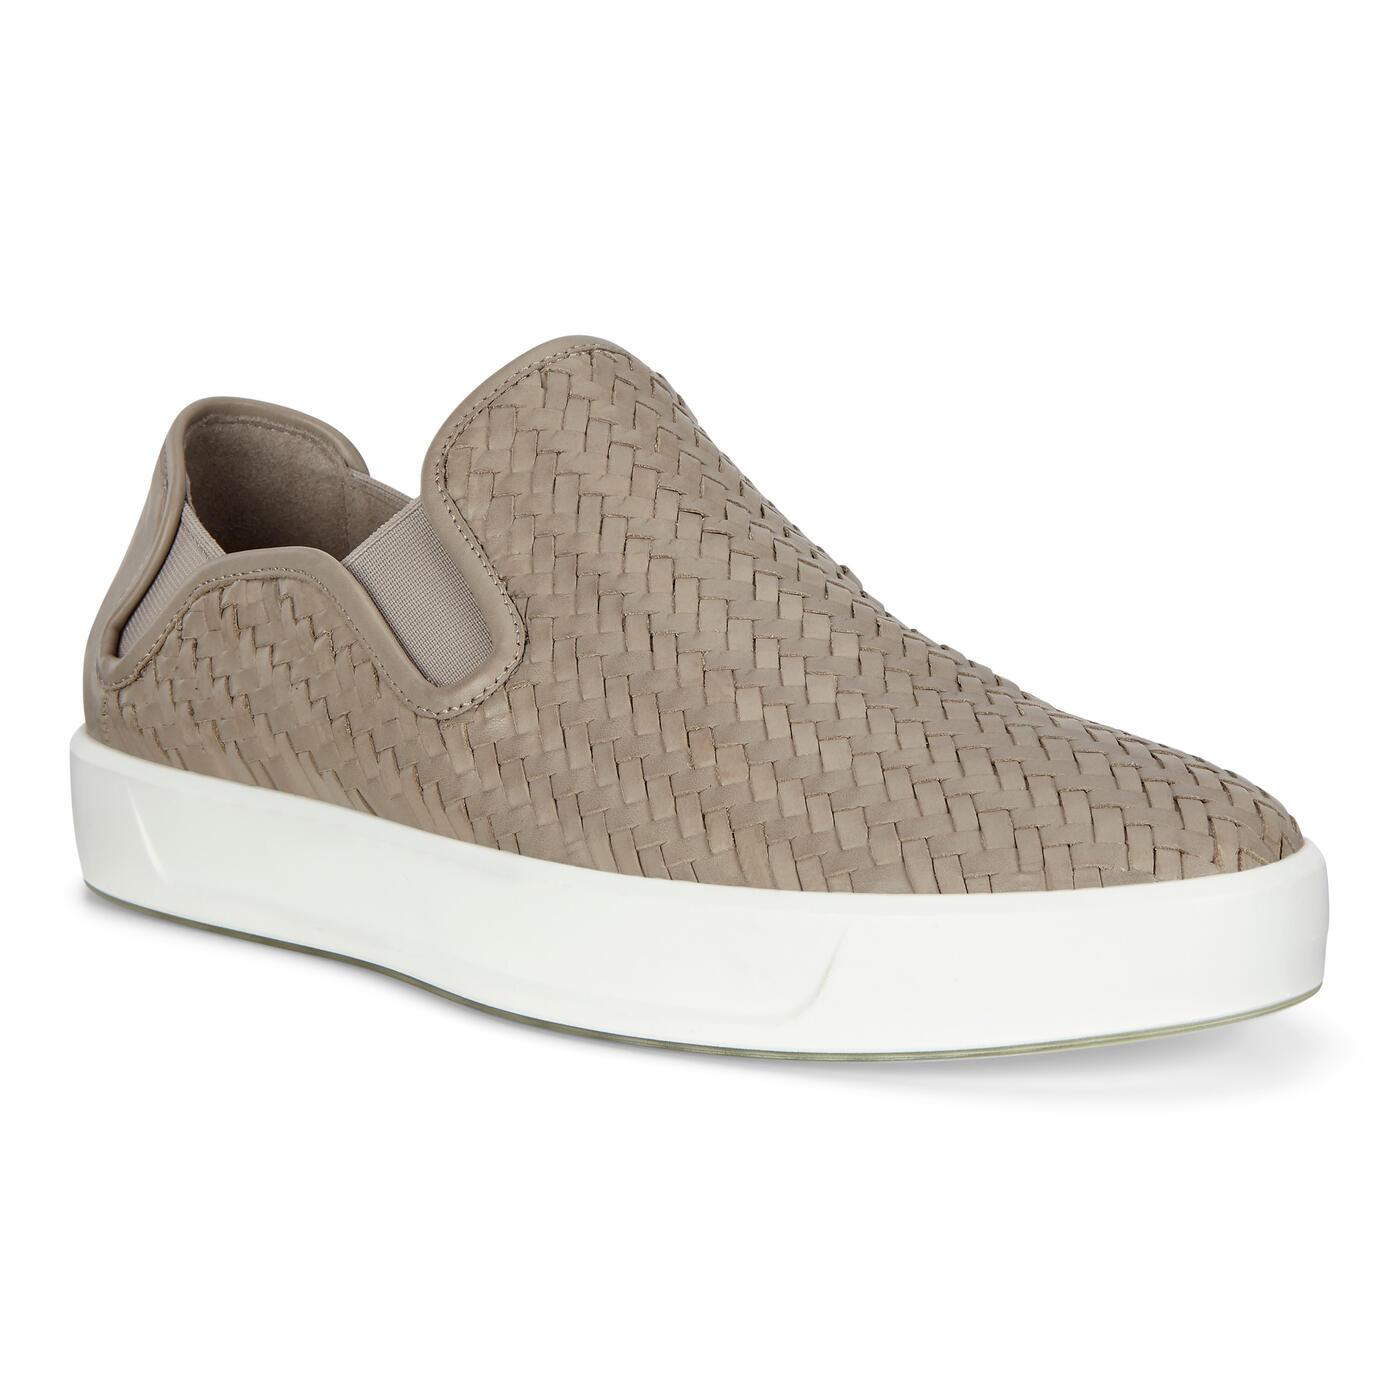 ECCO Soft 8 Men's Slip-On Sneakers